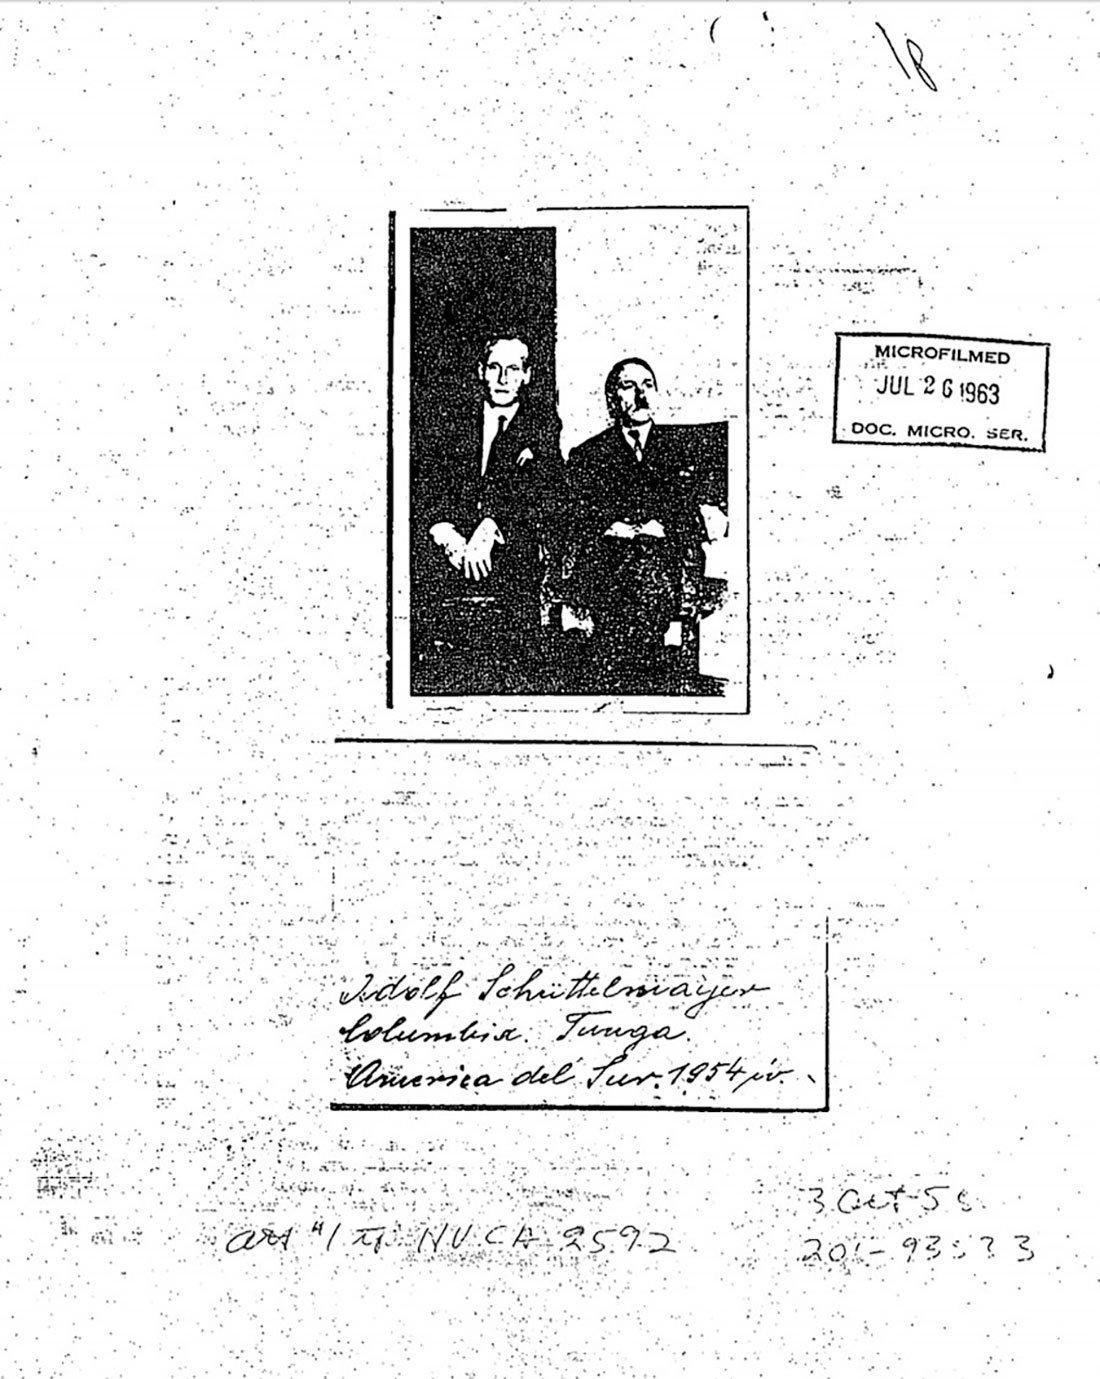 Foto anexada aos arquivos da CIA sobre a suposta presença de Hitler na América do Sul